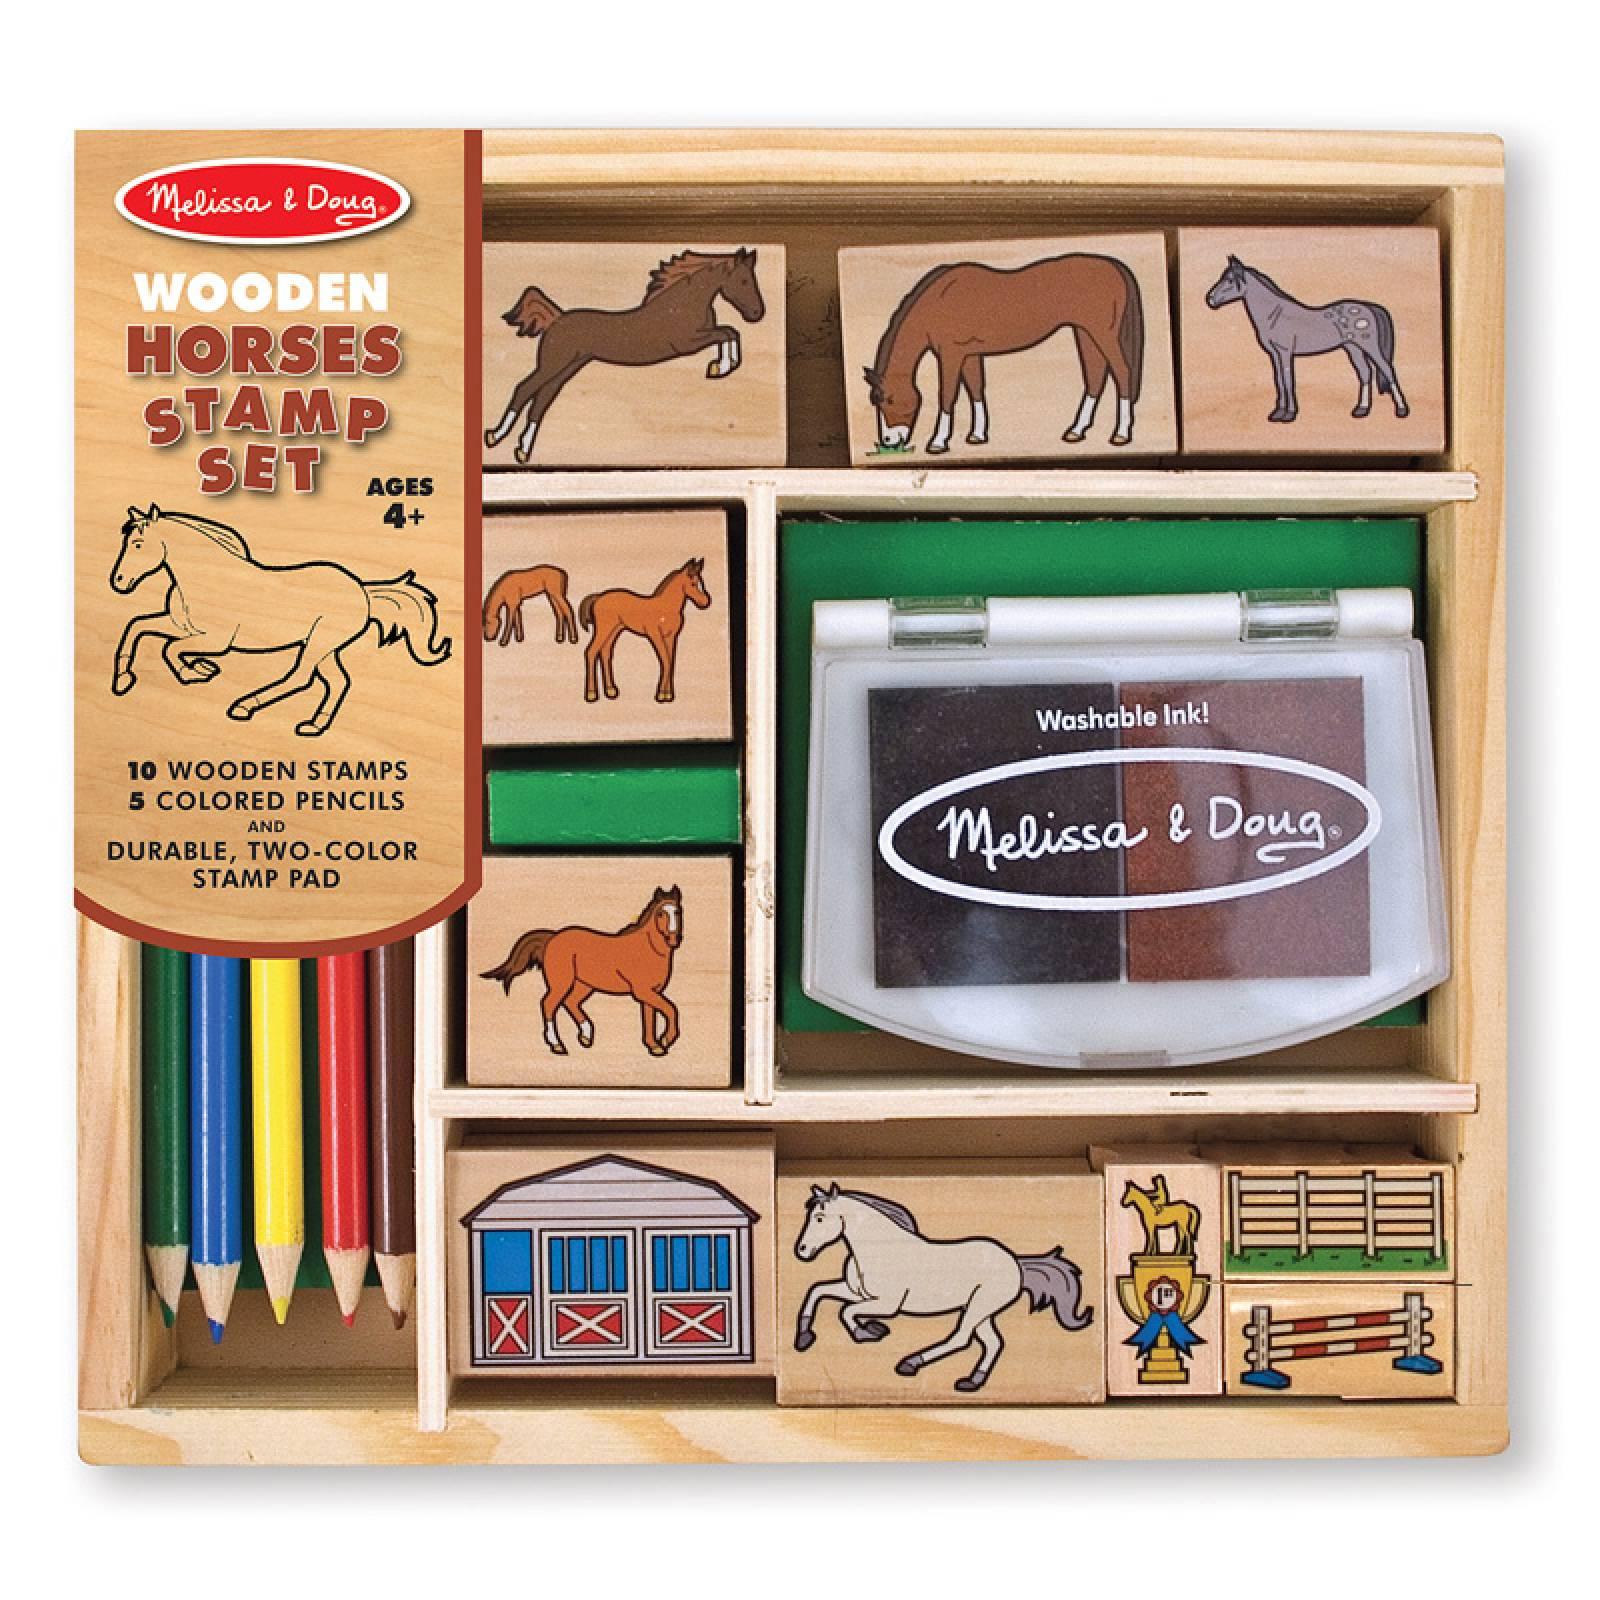 Wooden Stamp Set - Horses 4+ thumbnails